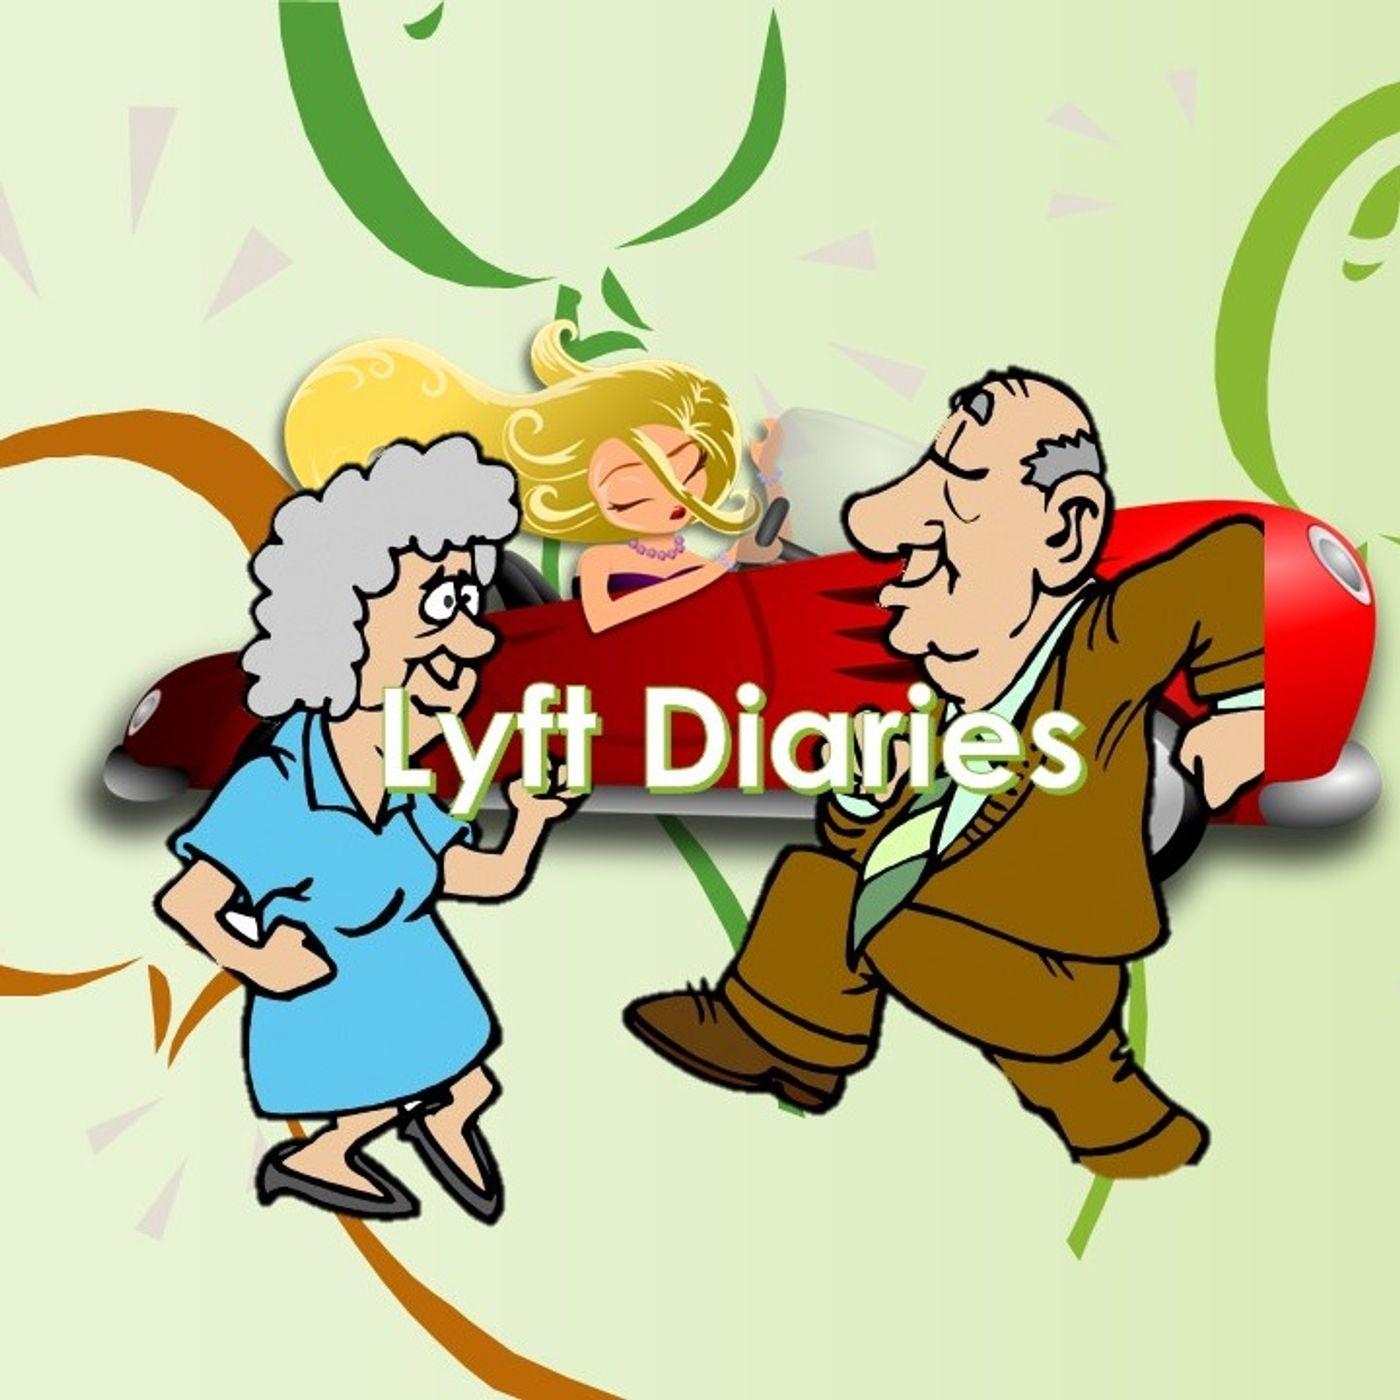 lyft-diaries-with-morgan-12_6_18